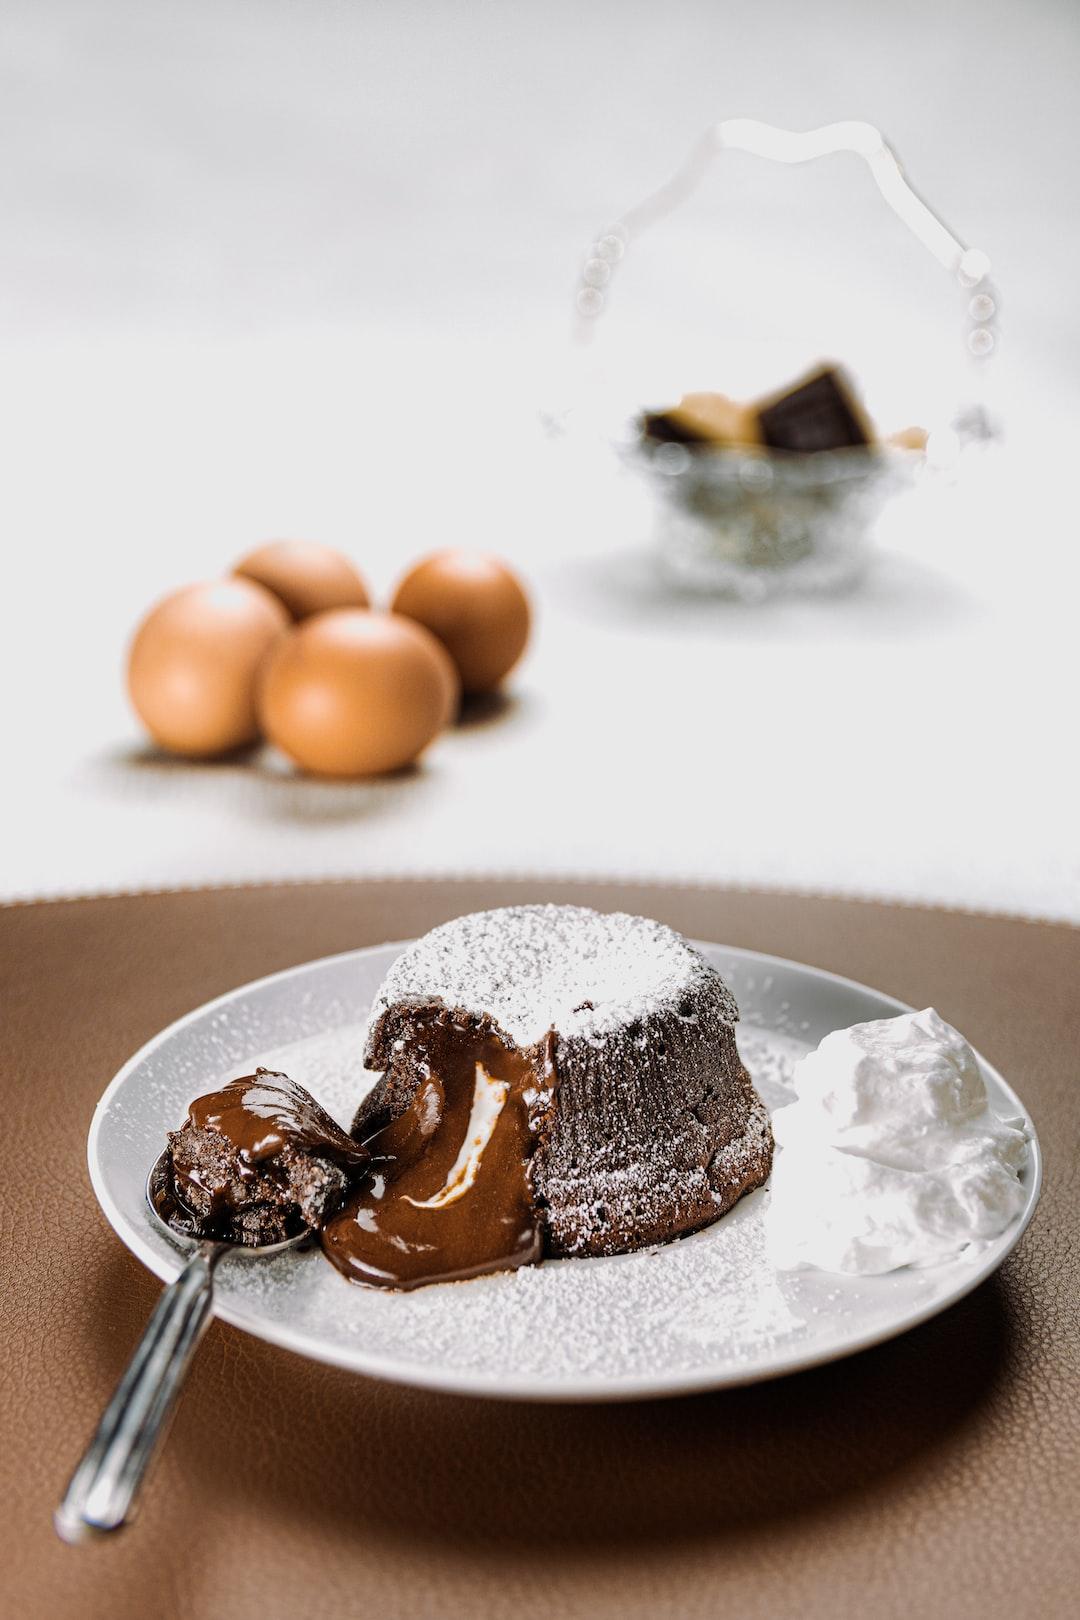 Bouble Chocolate Dessert - small cake